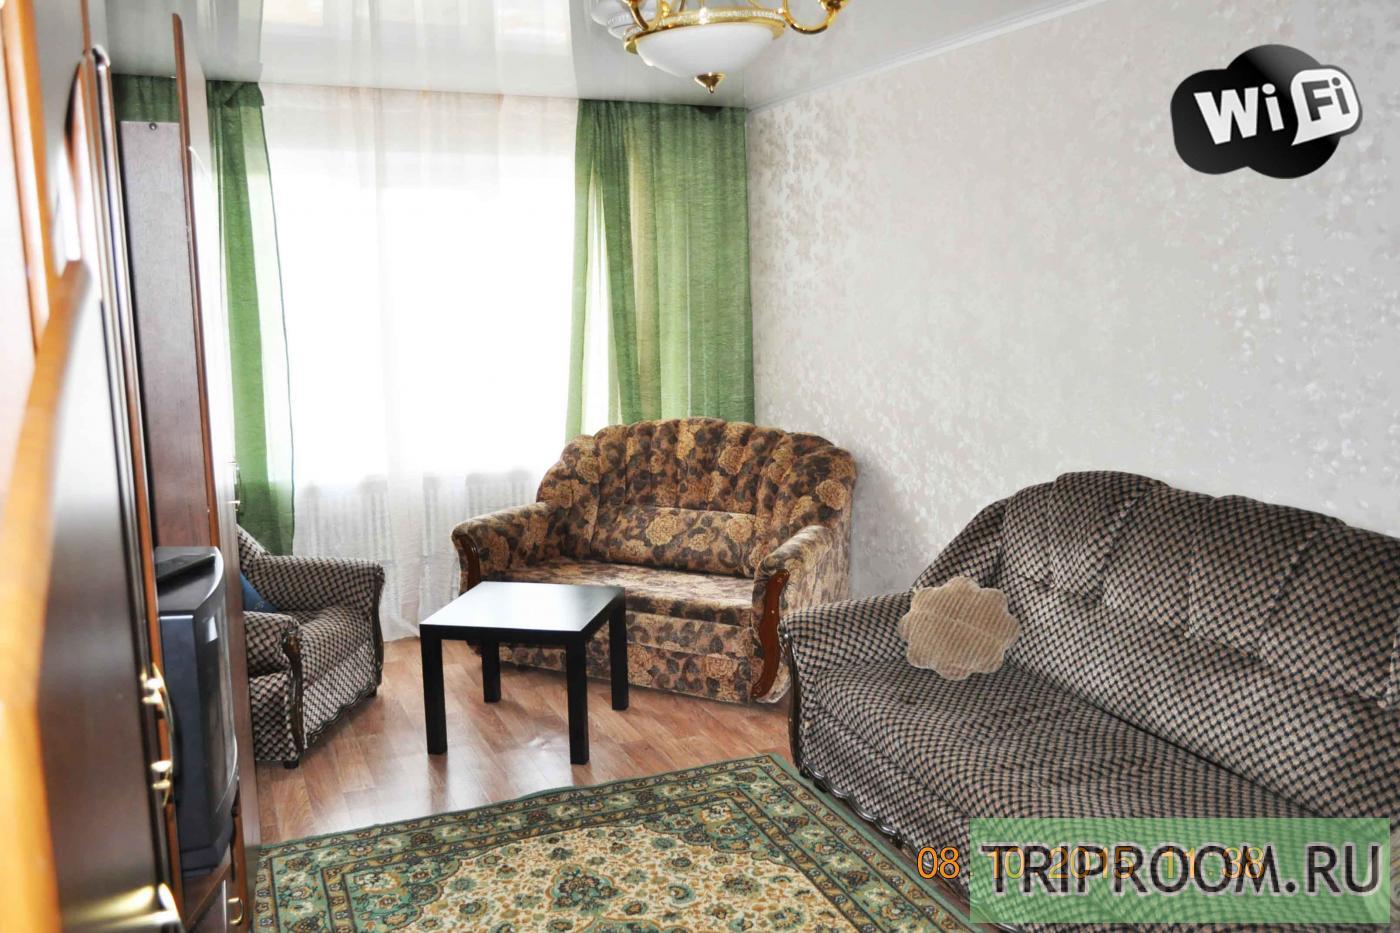 2-комнатная квартира посуточно (вариант № 11708), ул. Амосова улица, фото № 15